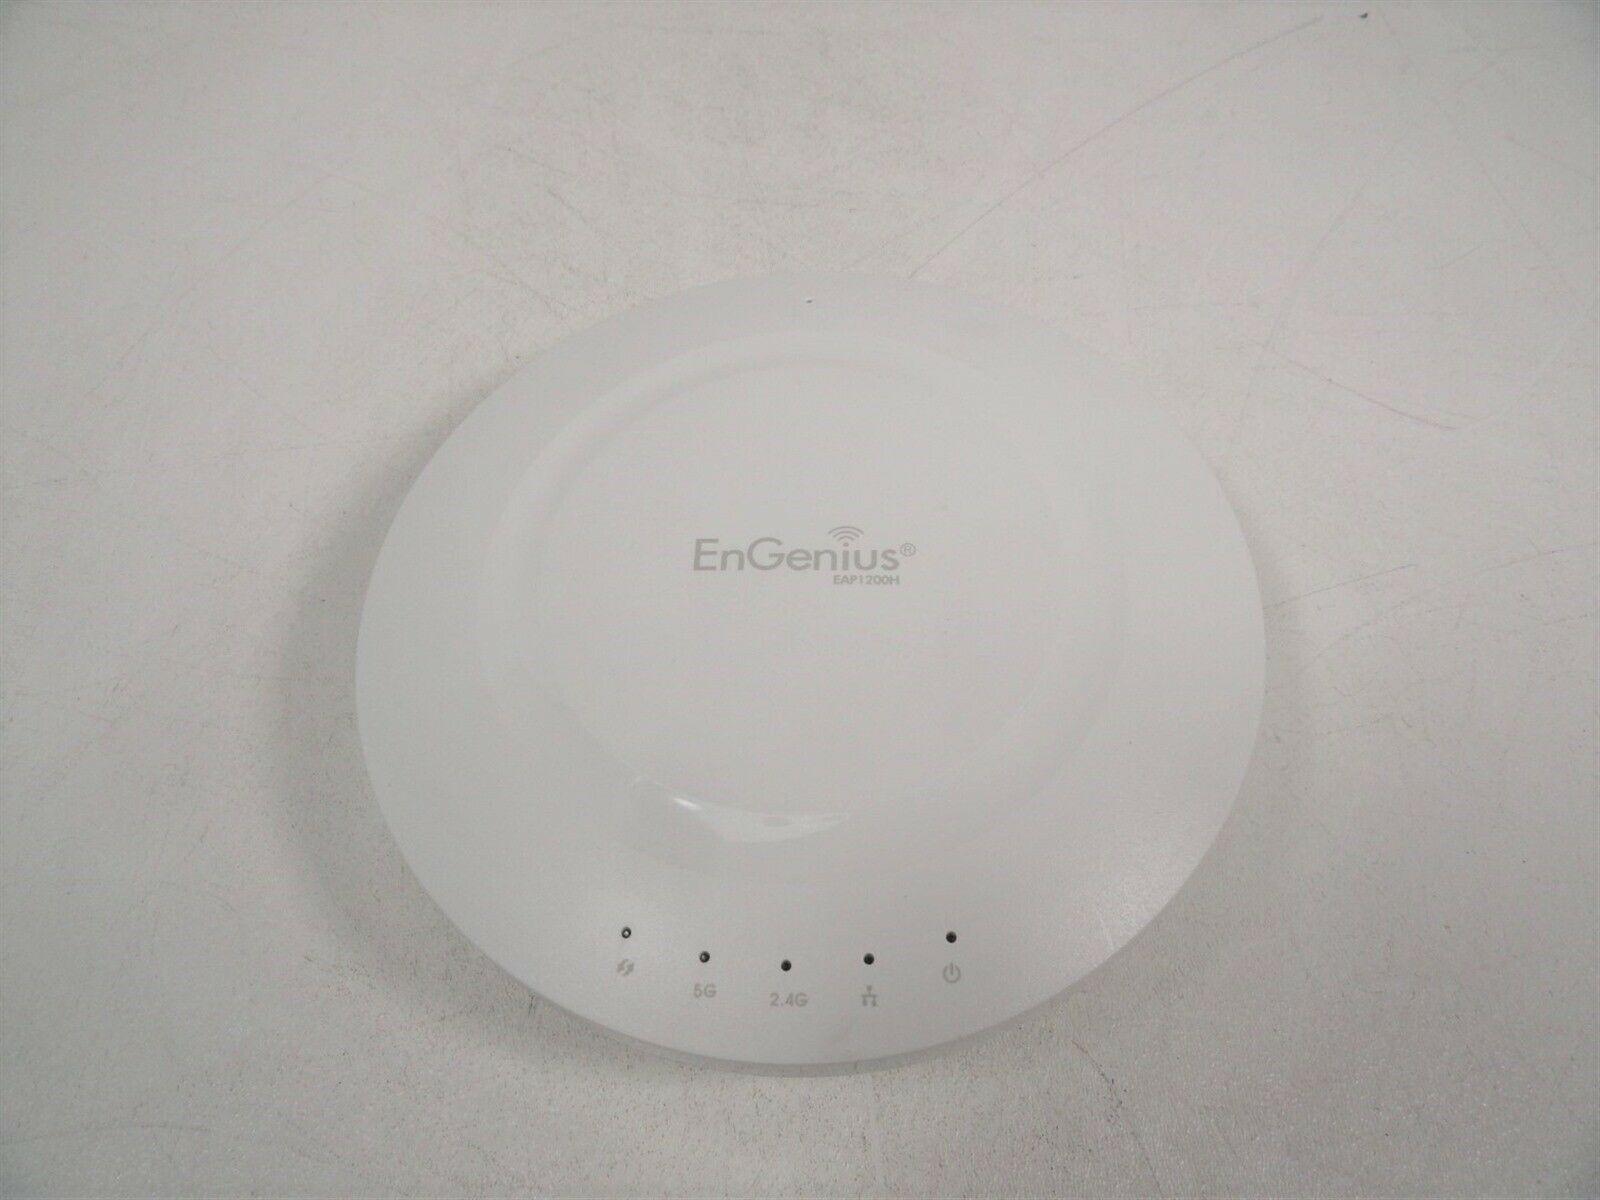 New EnGenius EAP1200H Indoor Wireless Access Point Open Box